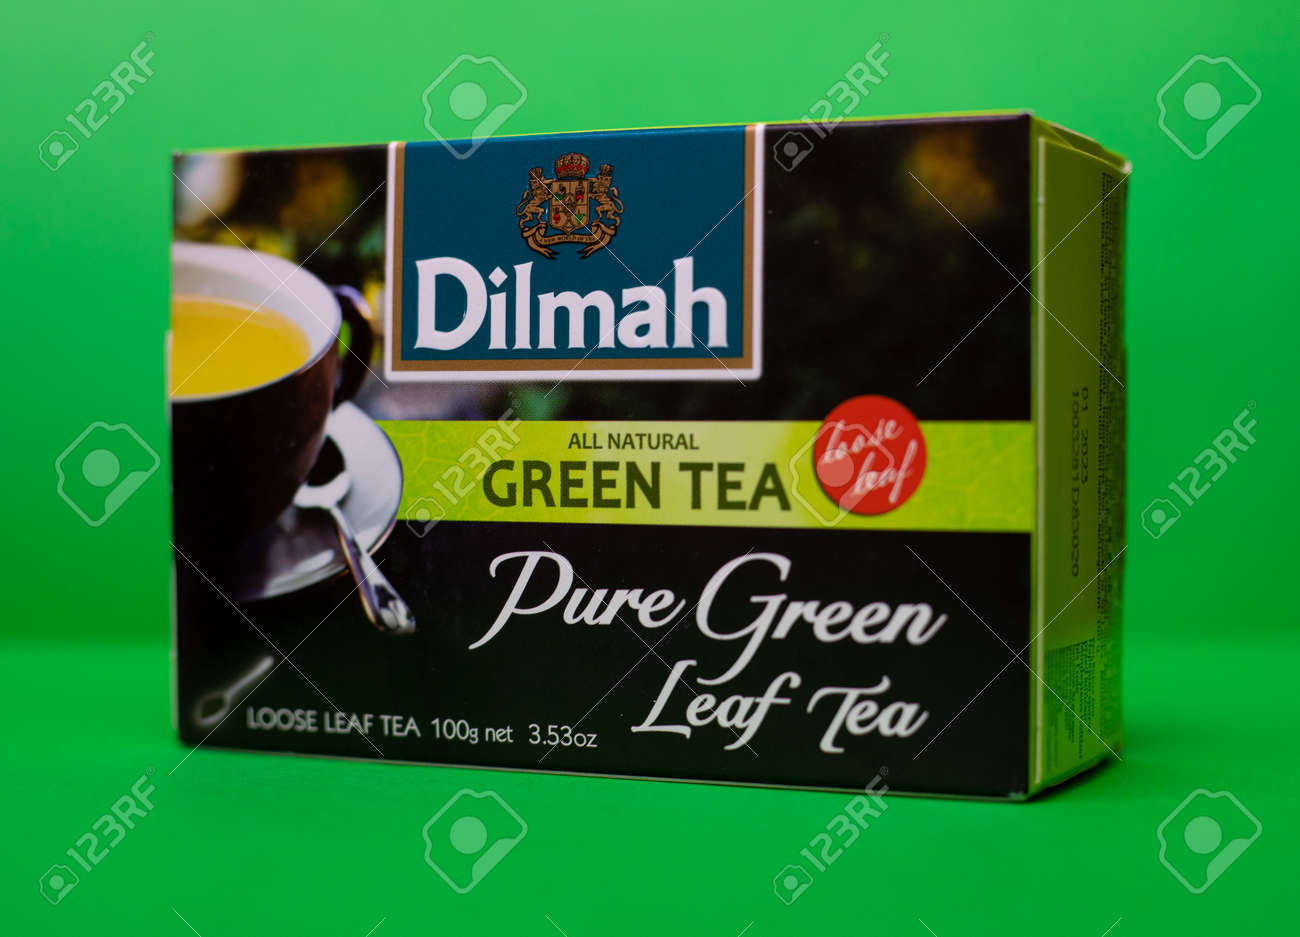 Dilmah tea. Natural pure green leaf tea. 01/06/2021. Warsaw, Poland - 162097093